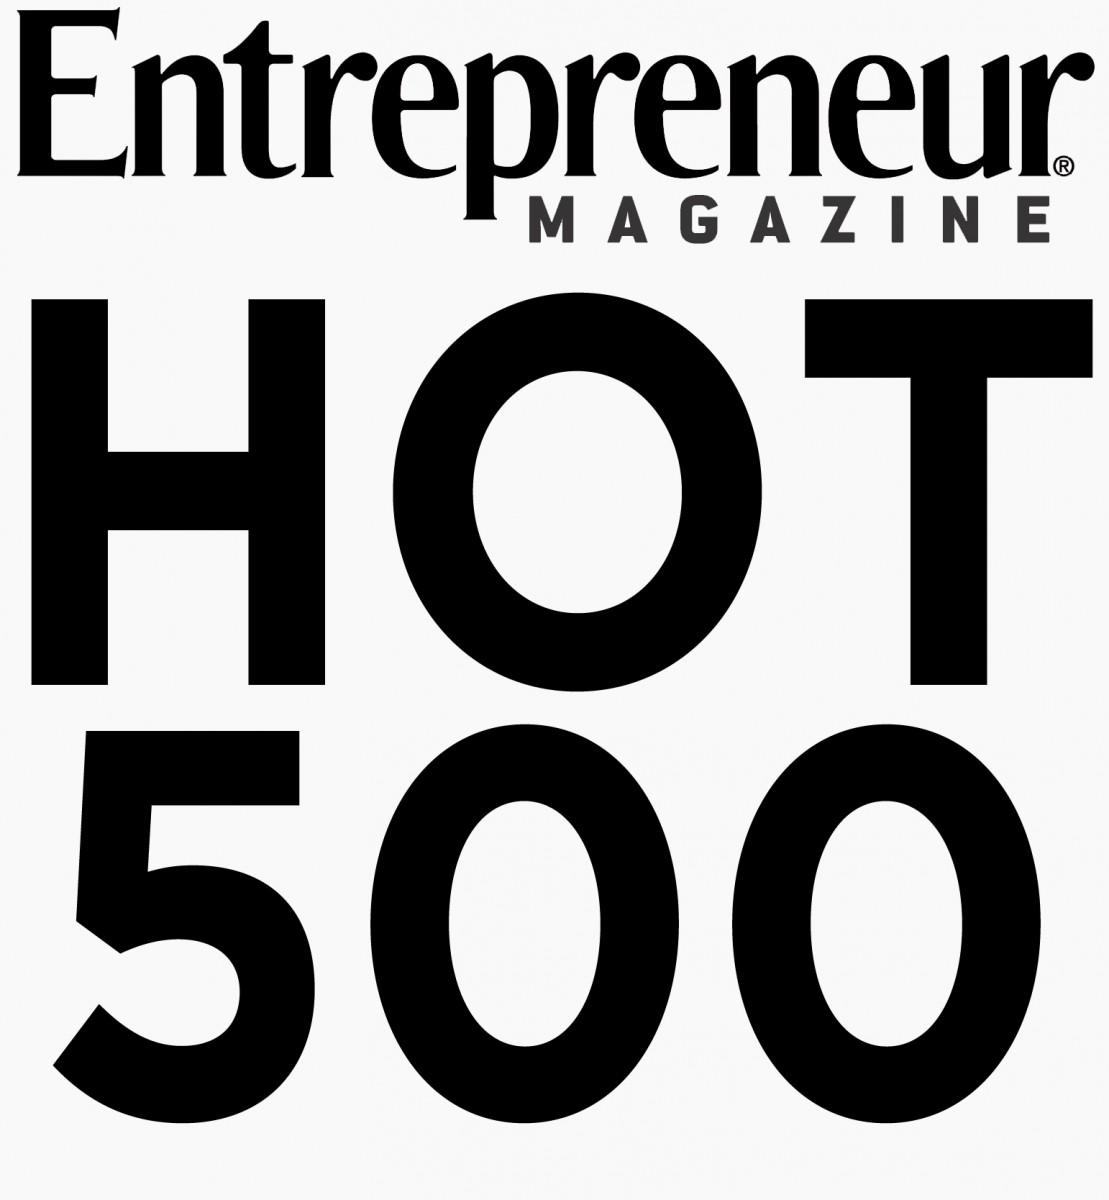 Summit Technical Solution's Hot 500 Award